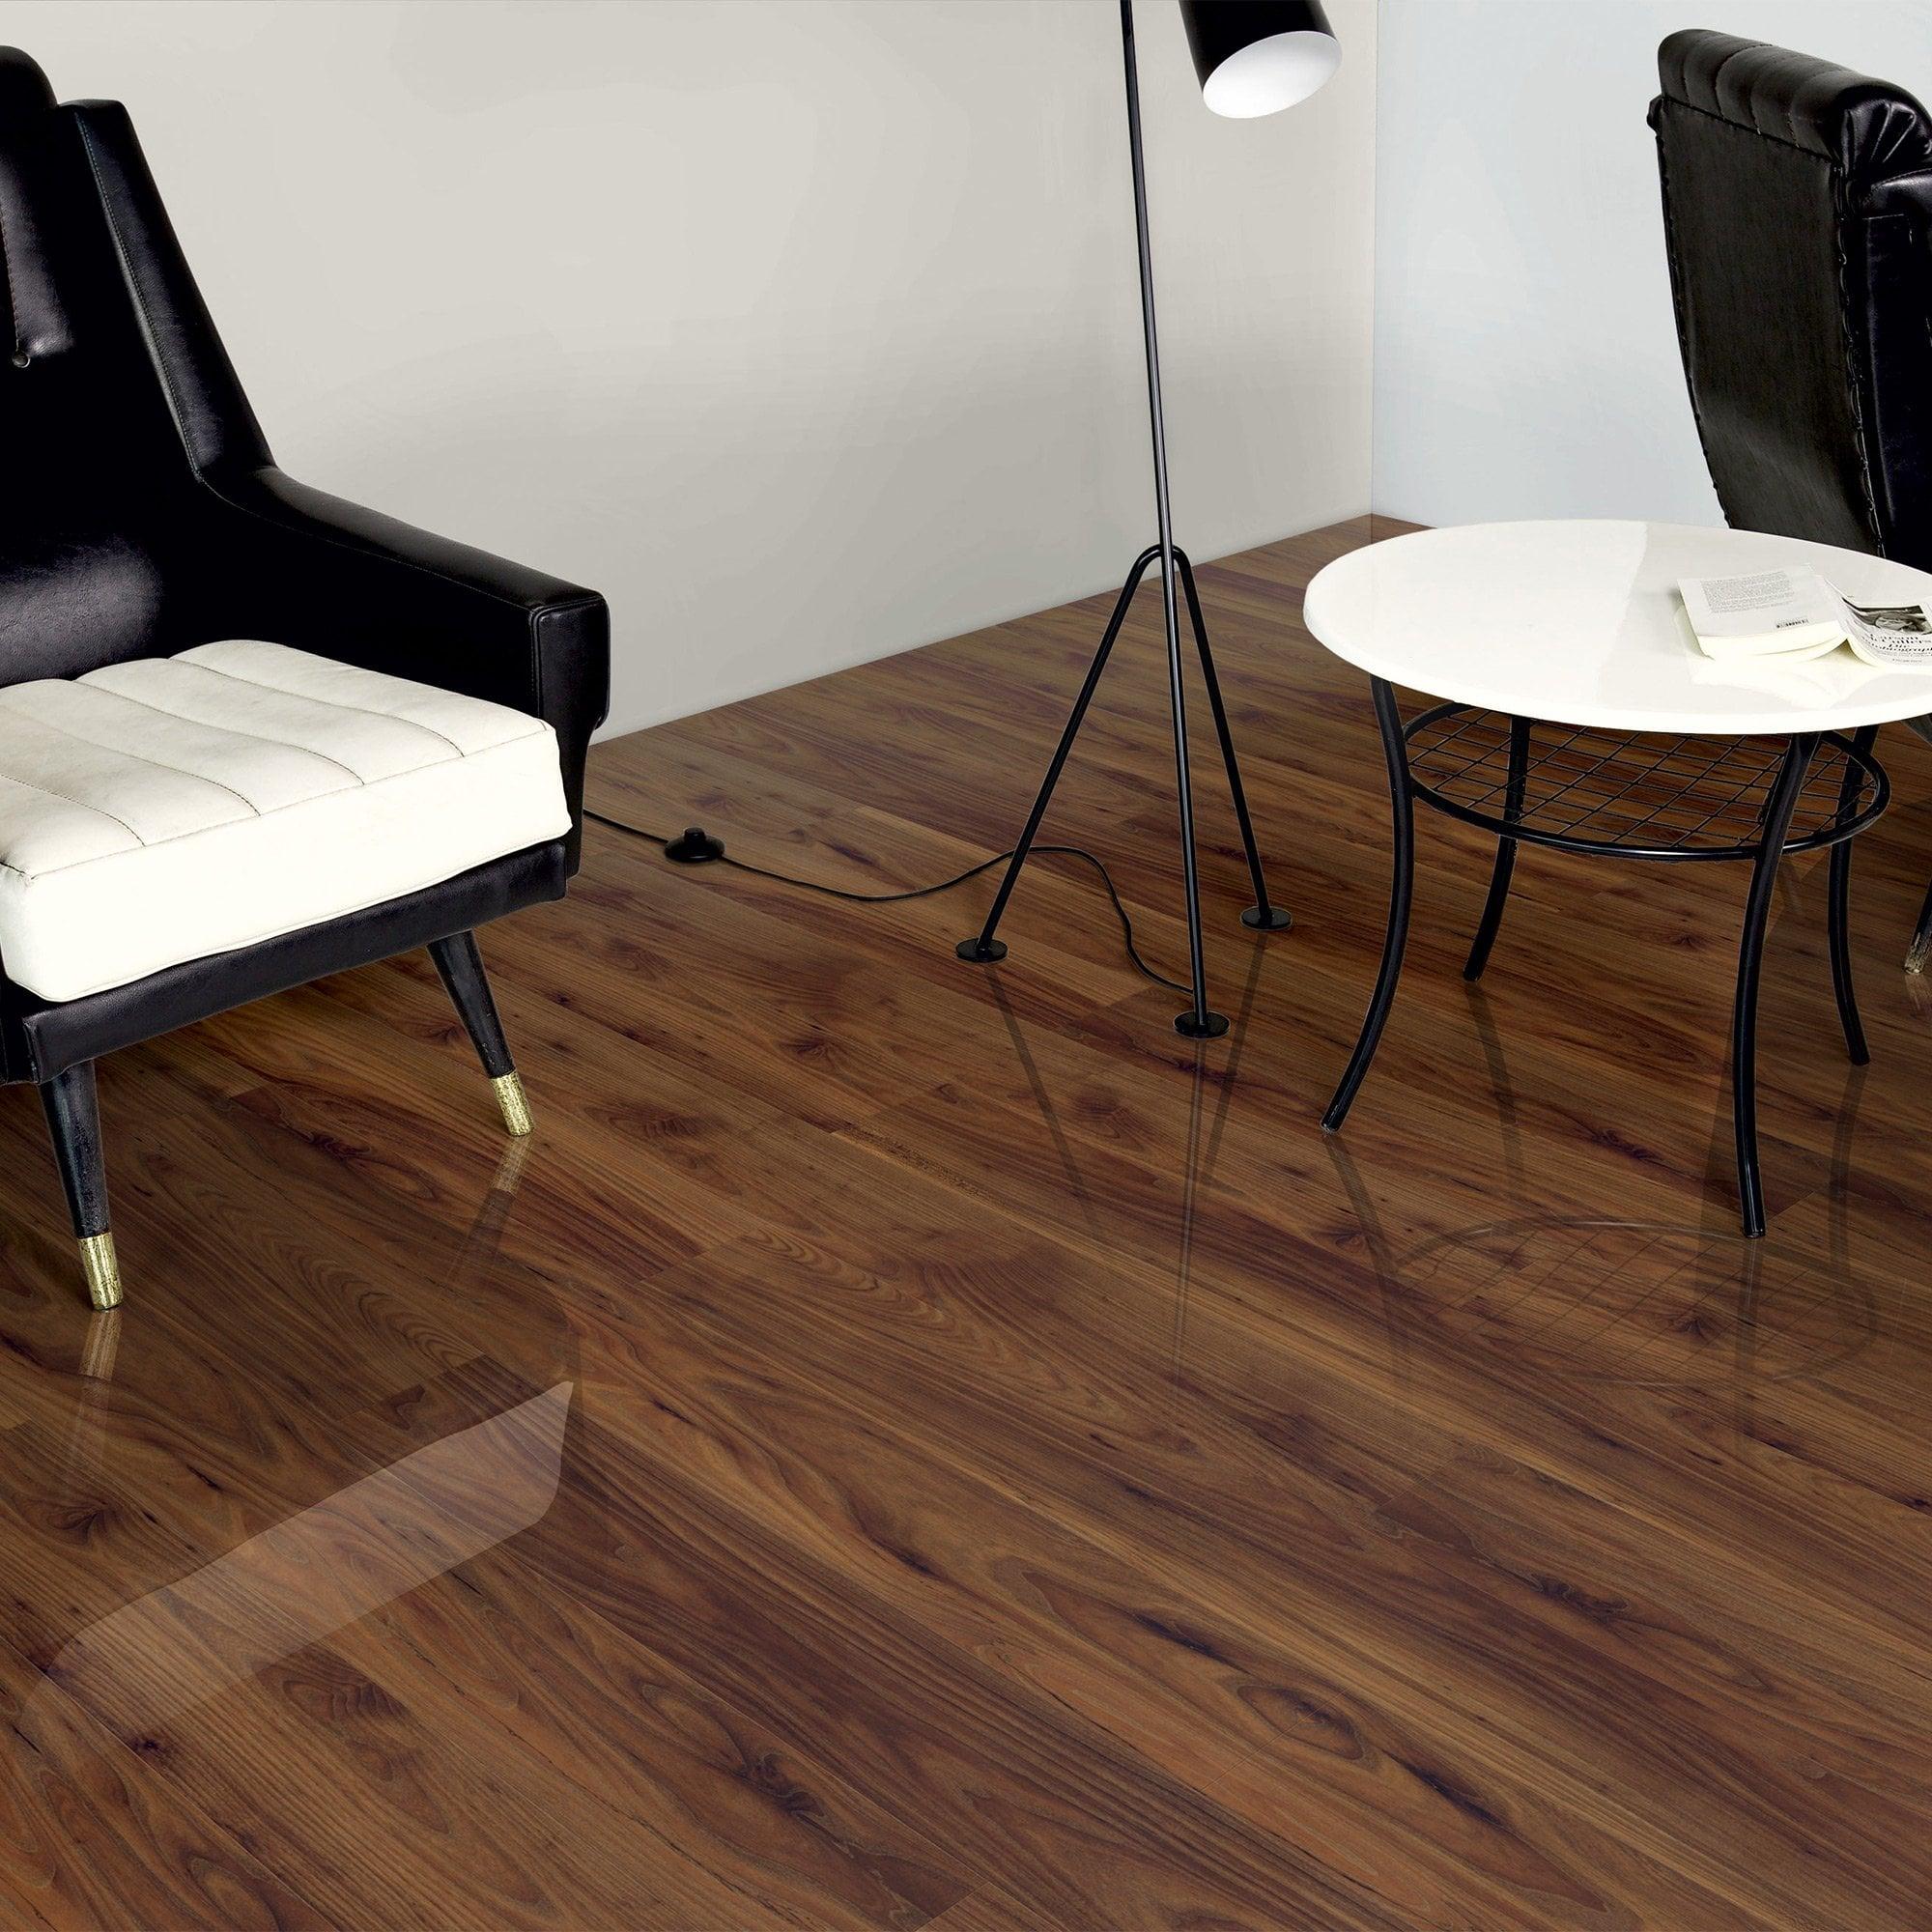 Home High Gloss 8mm Walnut Acacia 4V Laminate Flooring